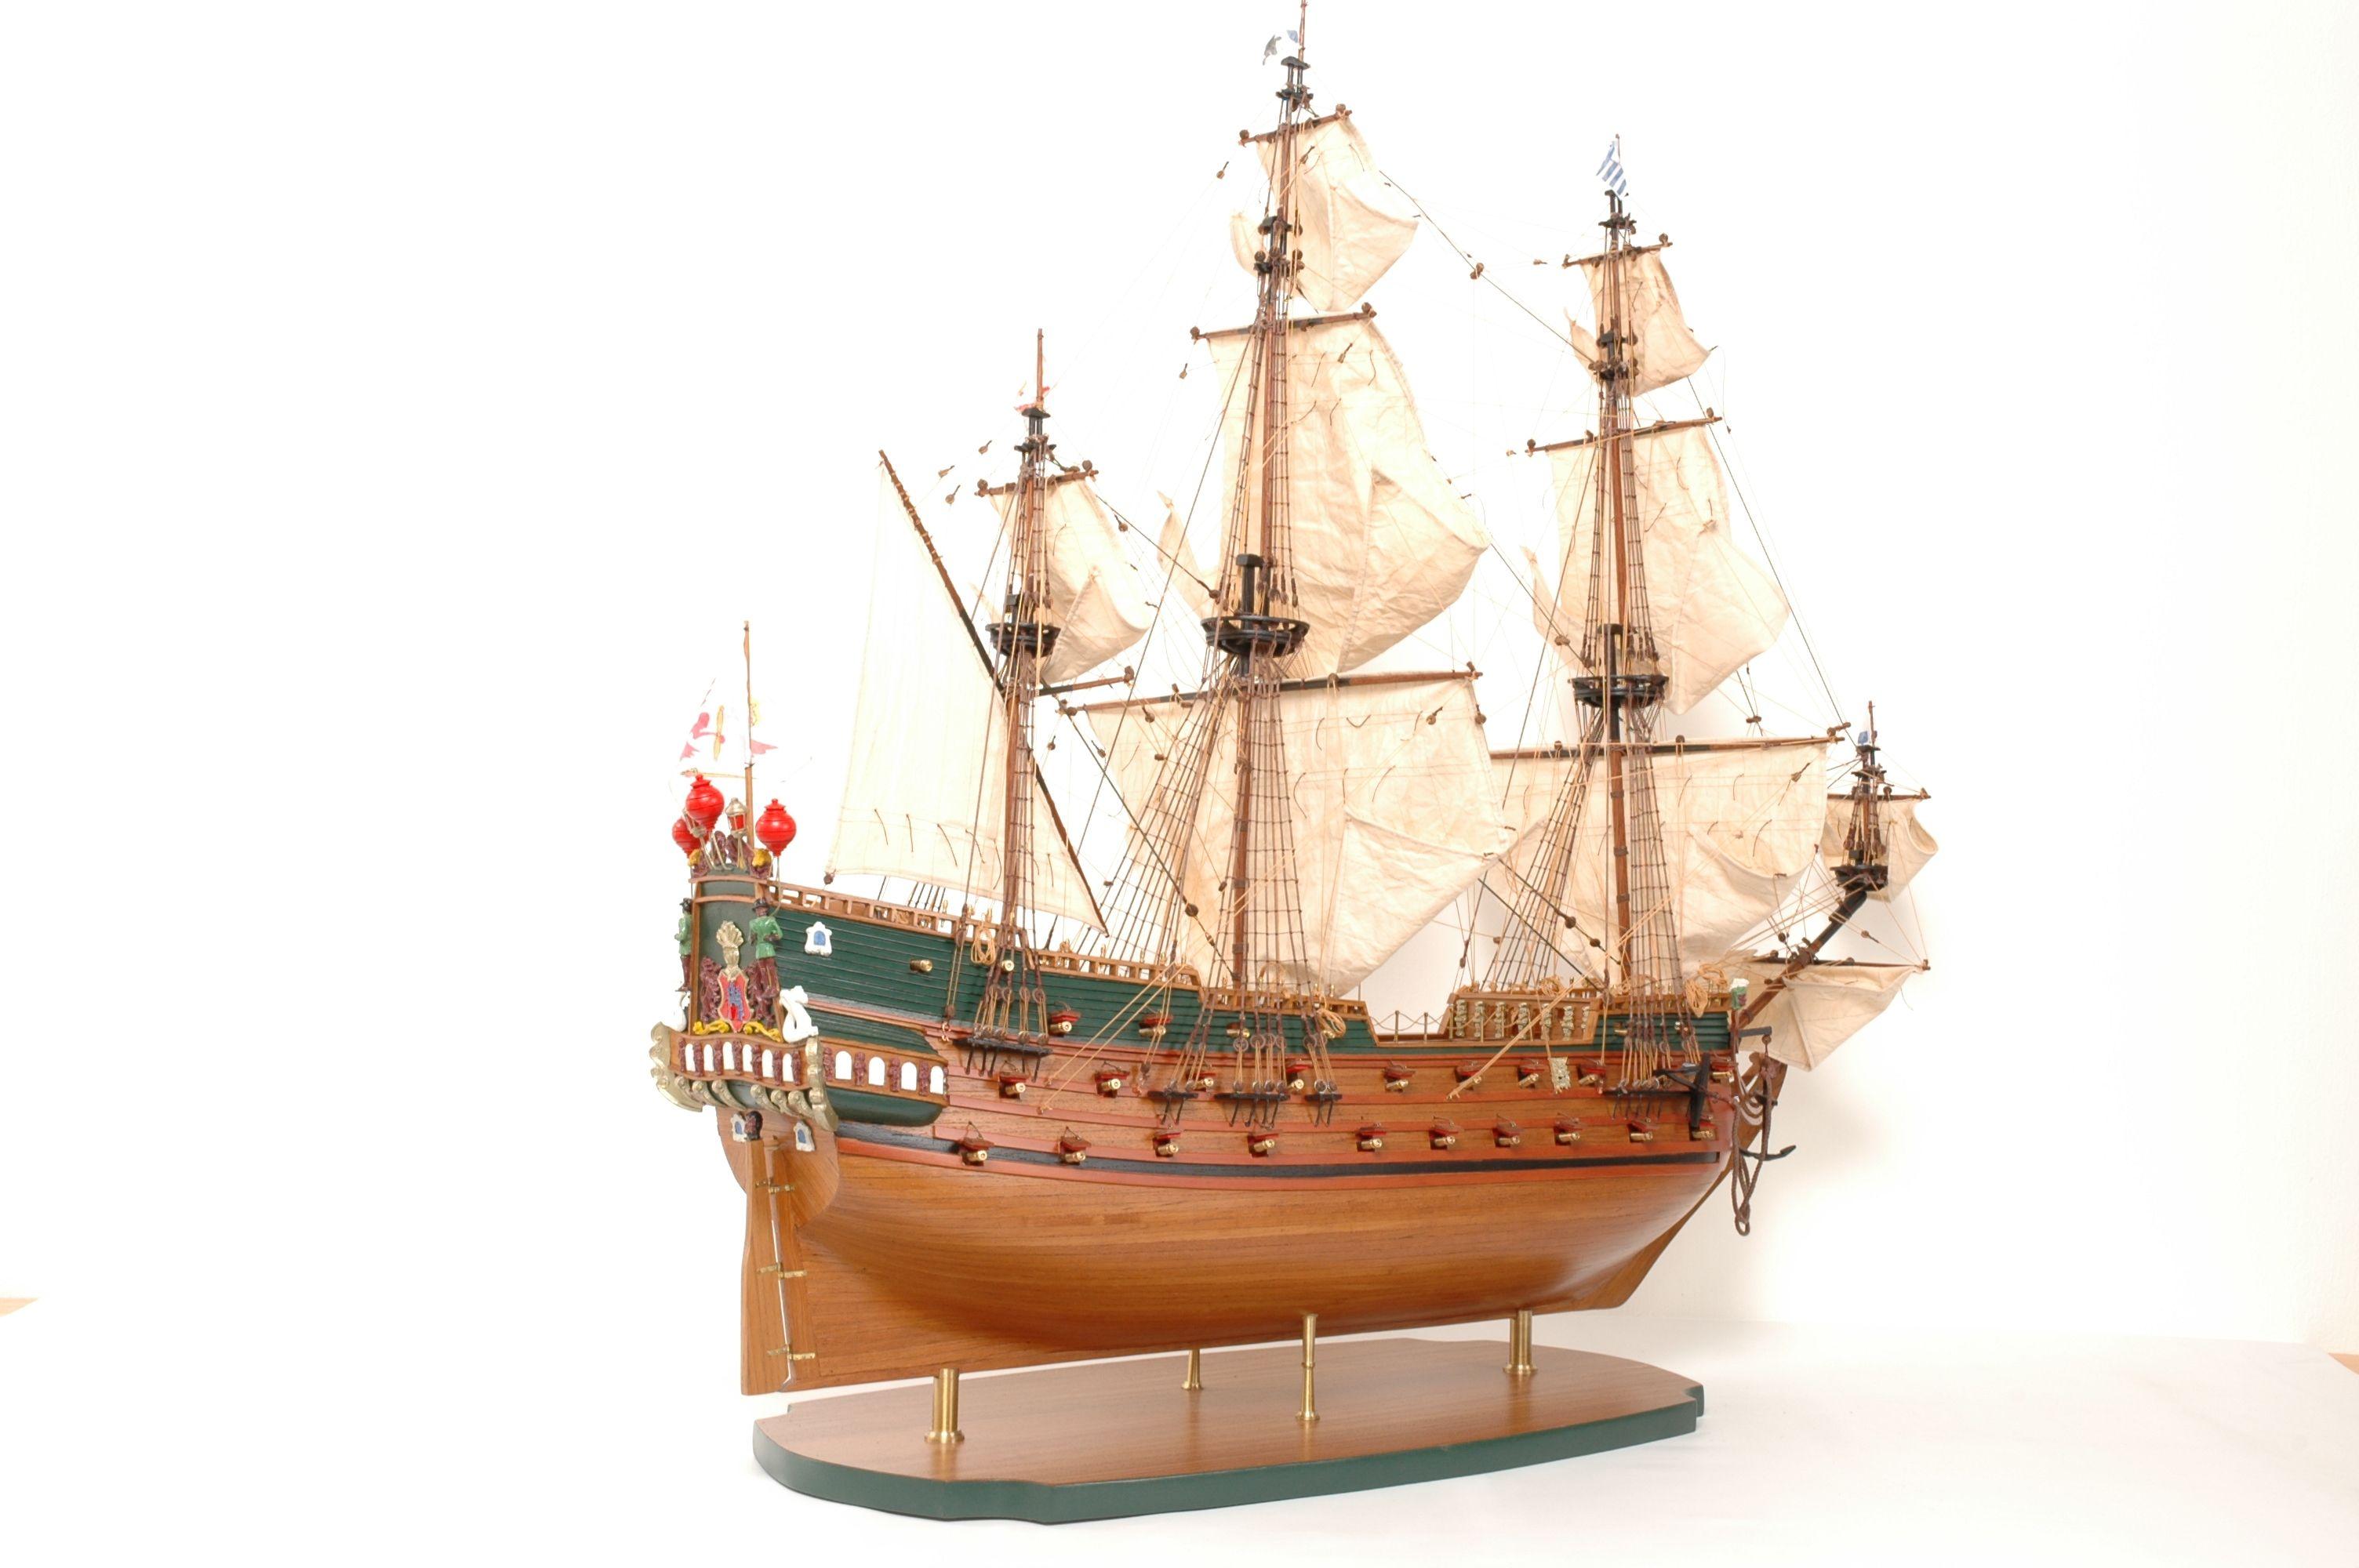 152-8210-Wappen-von-Hamburg-Ship-Model-Superior-Range